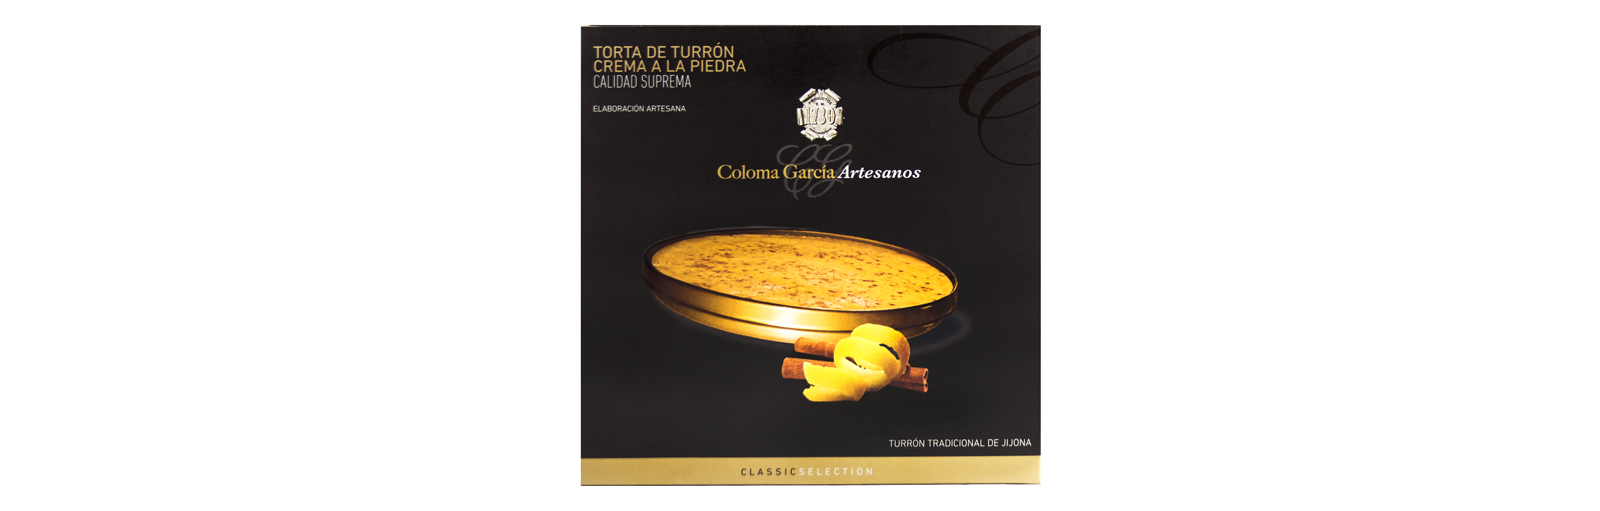 TORTA DE TURRON CREMA A LA PIEDRA